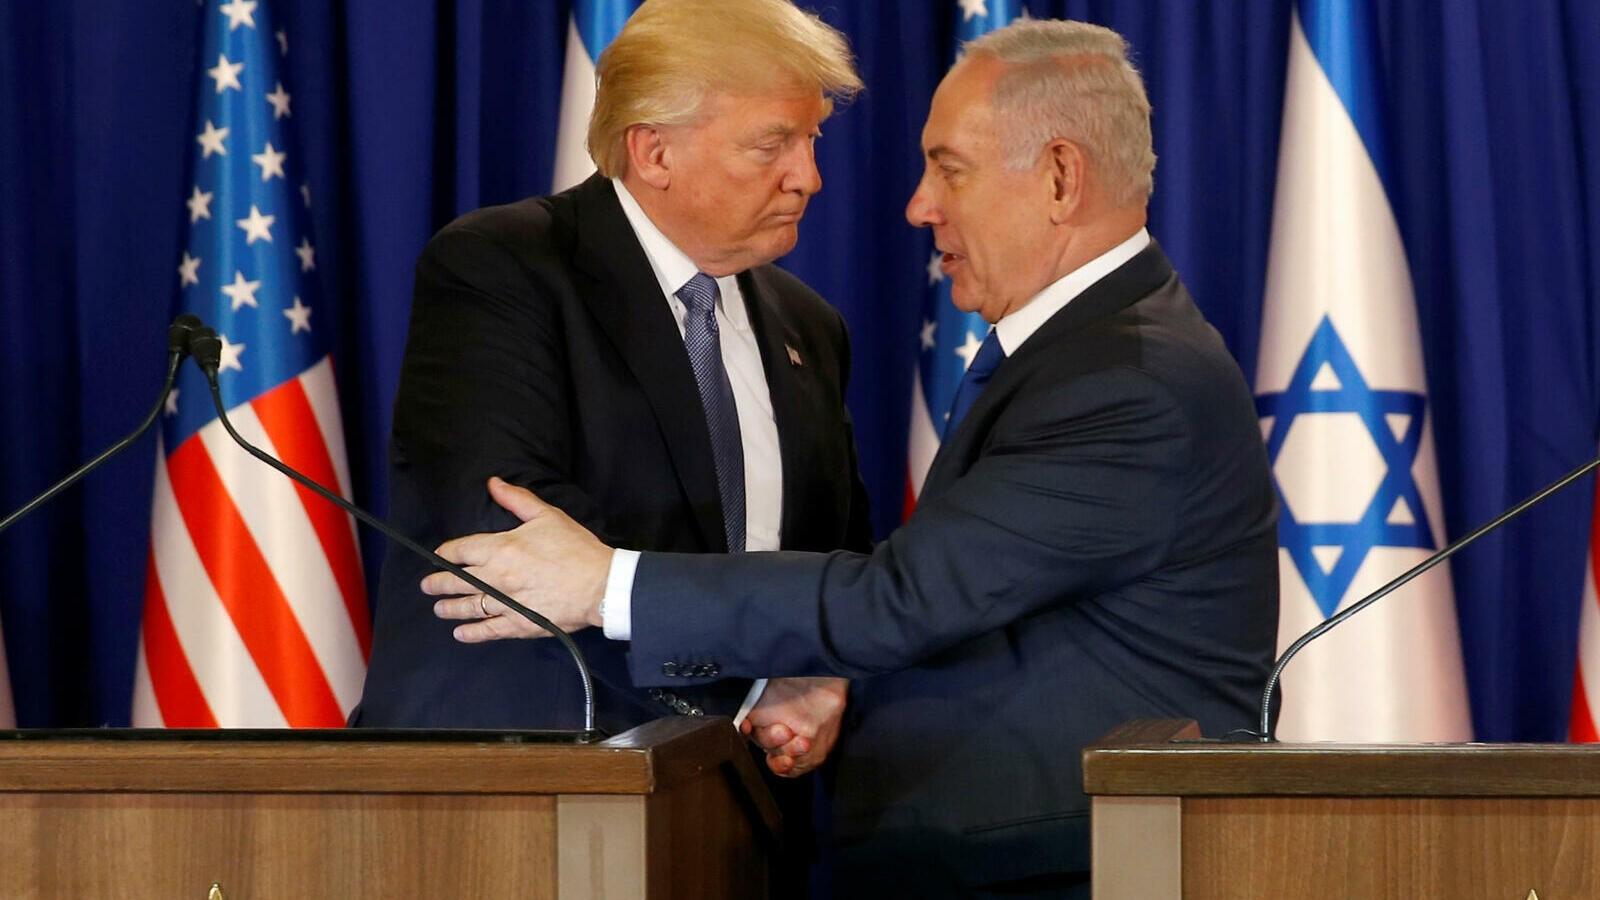 اسرائيل تحرض ترامب على ايران